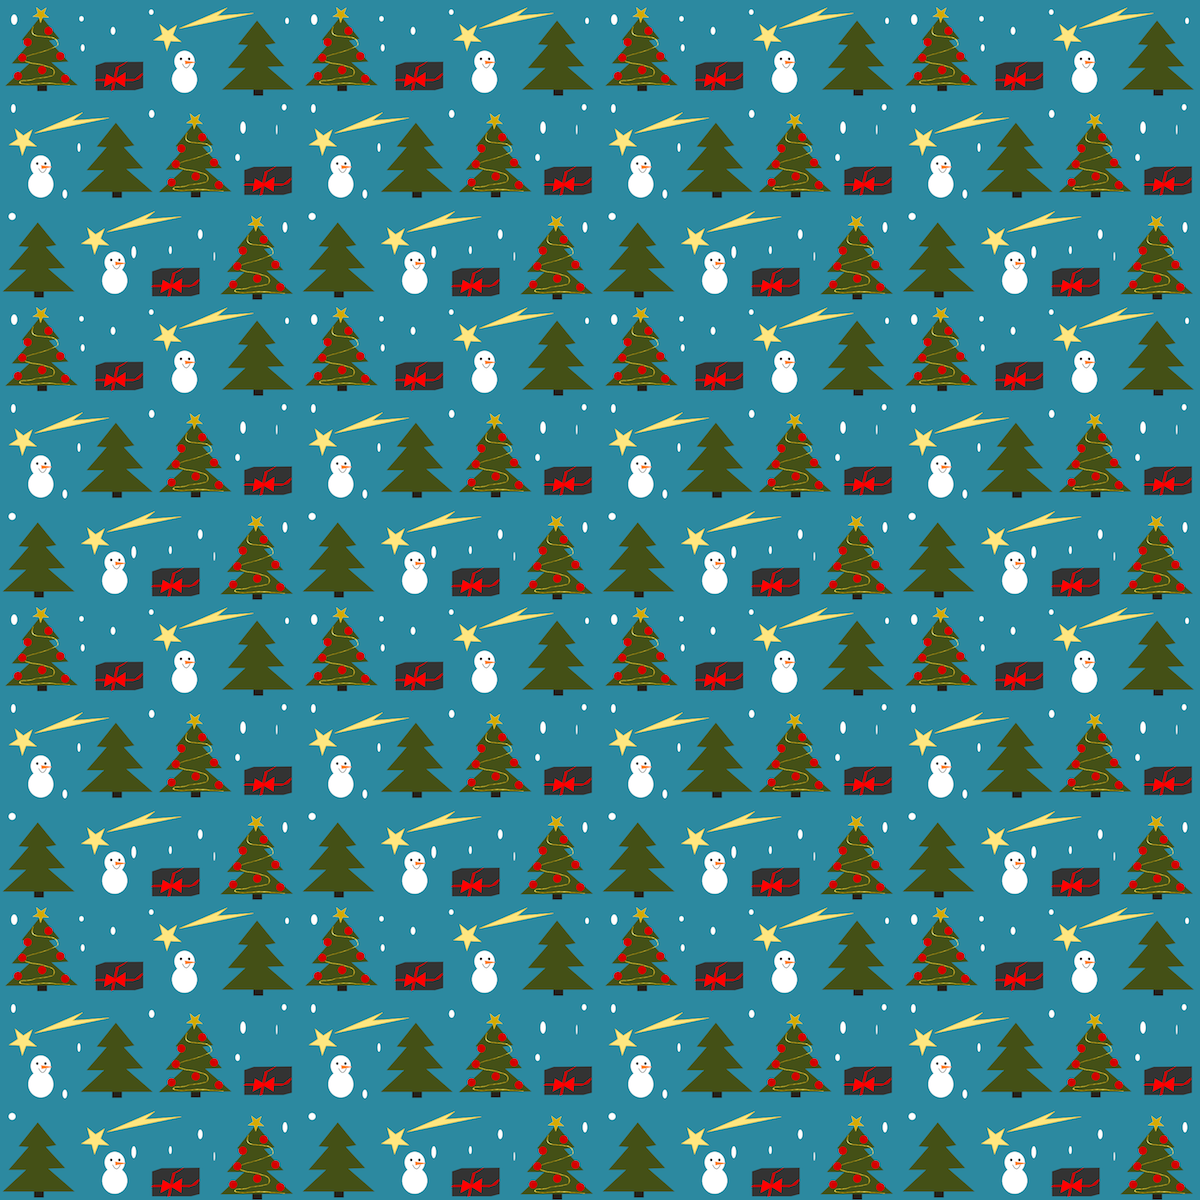 free printable christmas patterns - Forte.euforic.co